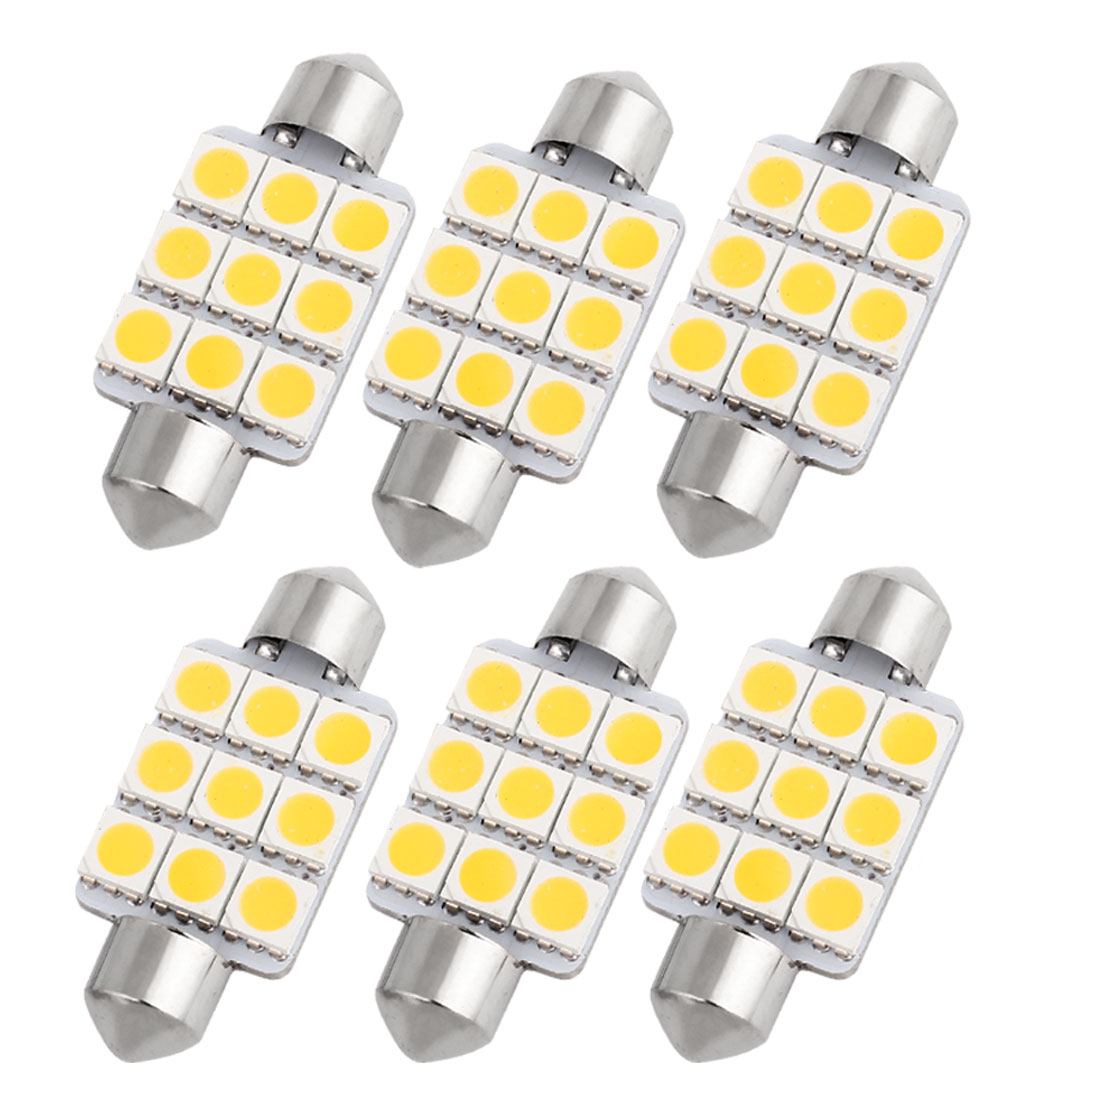 "6 Pcs 39mm 1.54"" 5050 SMD 9-LED Warm White Festoon Dome Light Bulb DE3425 DE3423 Internal"